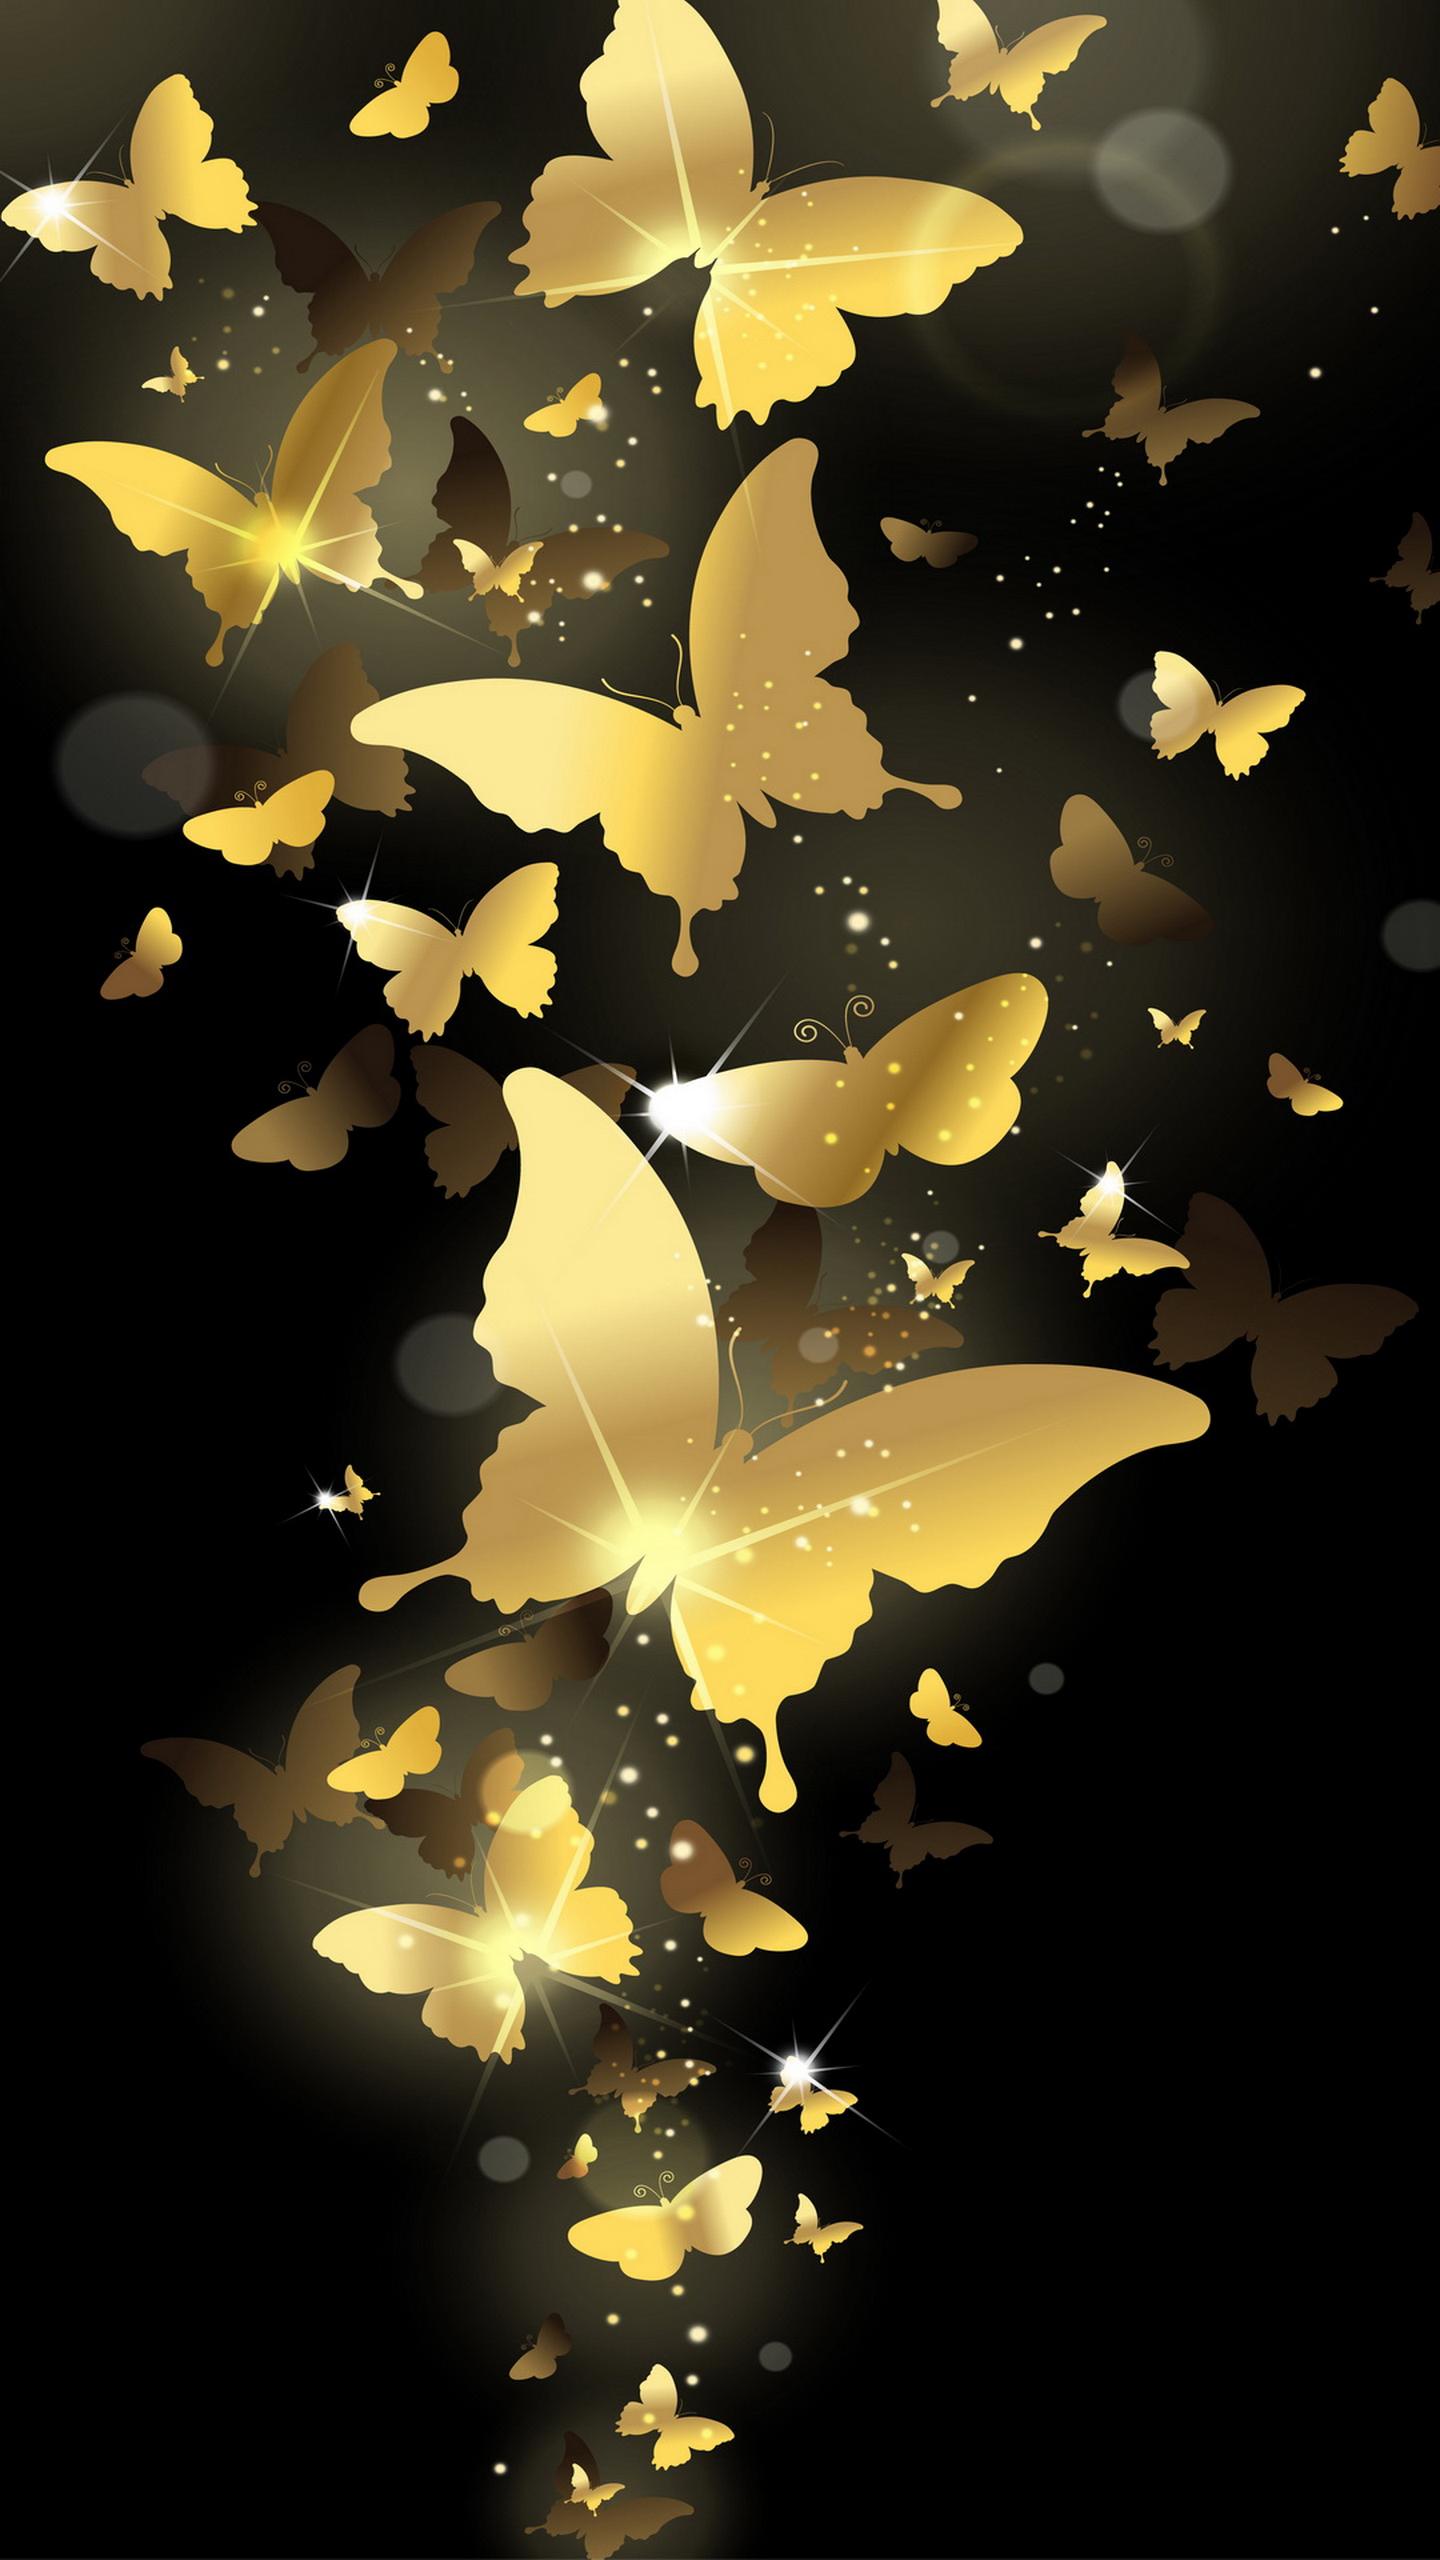 Flying golden butterflies lockscreen lock screen 1440x2560 samsung galaxy note 4 wallpaper quad for Sfondi full hd per smartphone